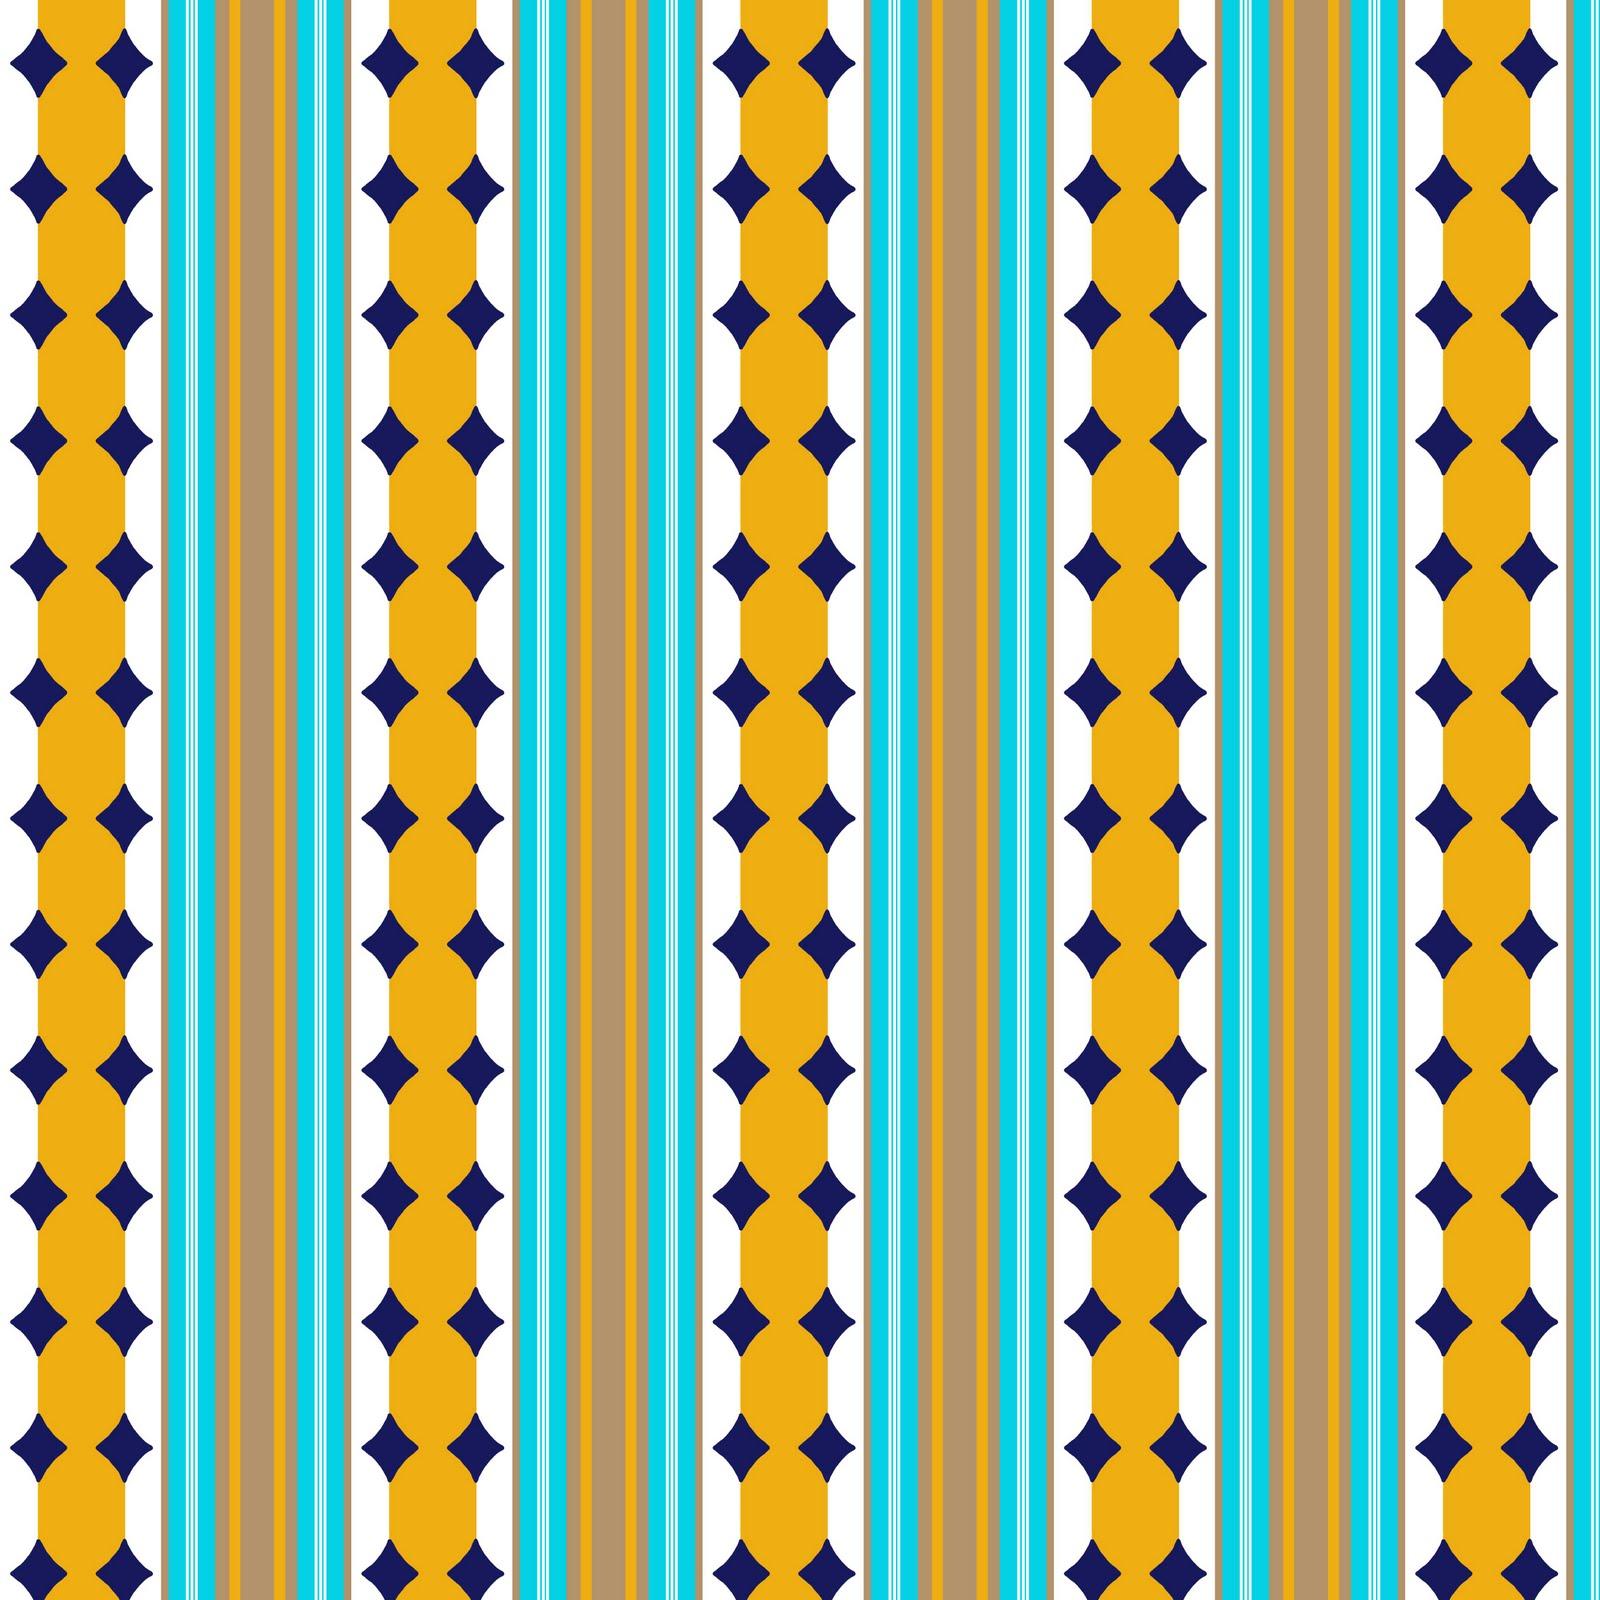 wallpaper border stripe radial bold wallpaper all over pattern 1600x1600